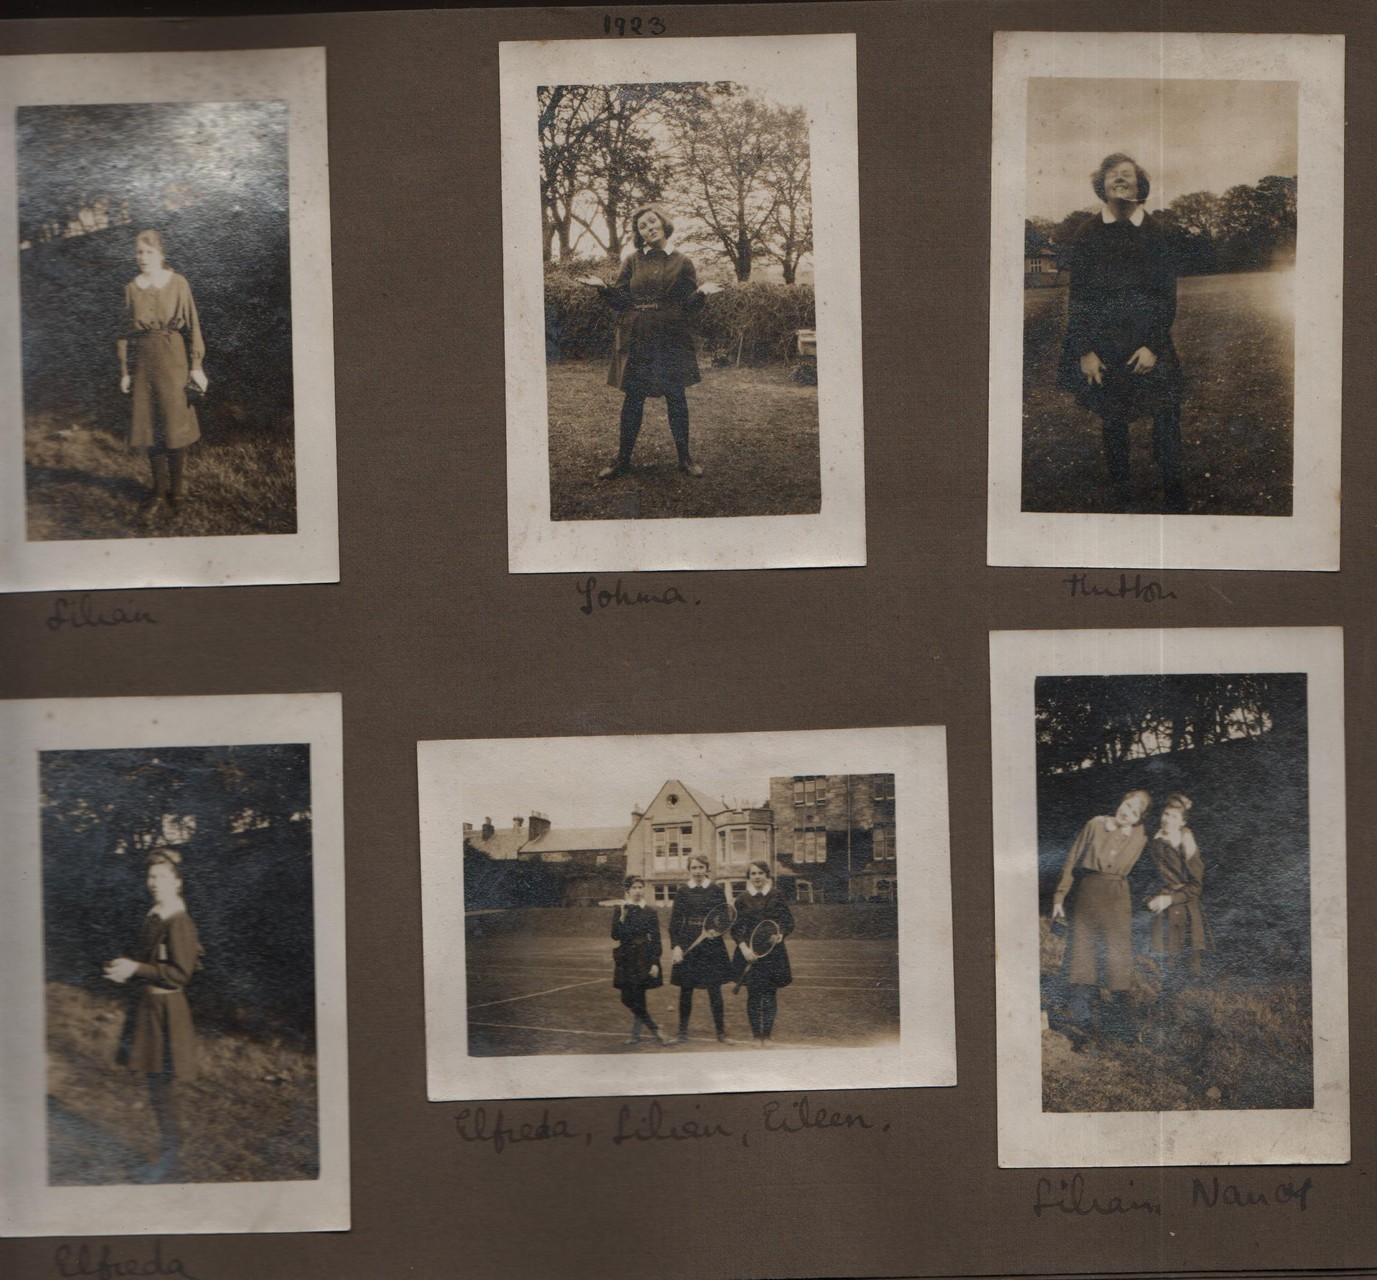 1923: Lilian; Johma; Hutton; Elfreda; Elfreda, Lilian, Eileen; Lilian, Nancy